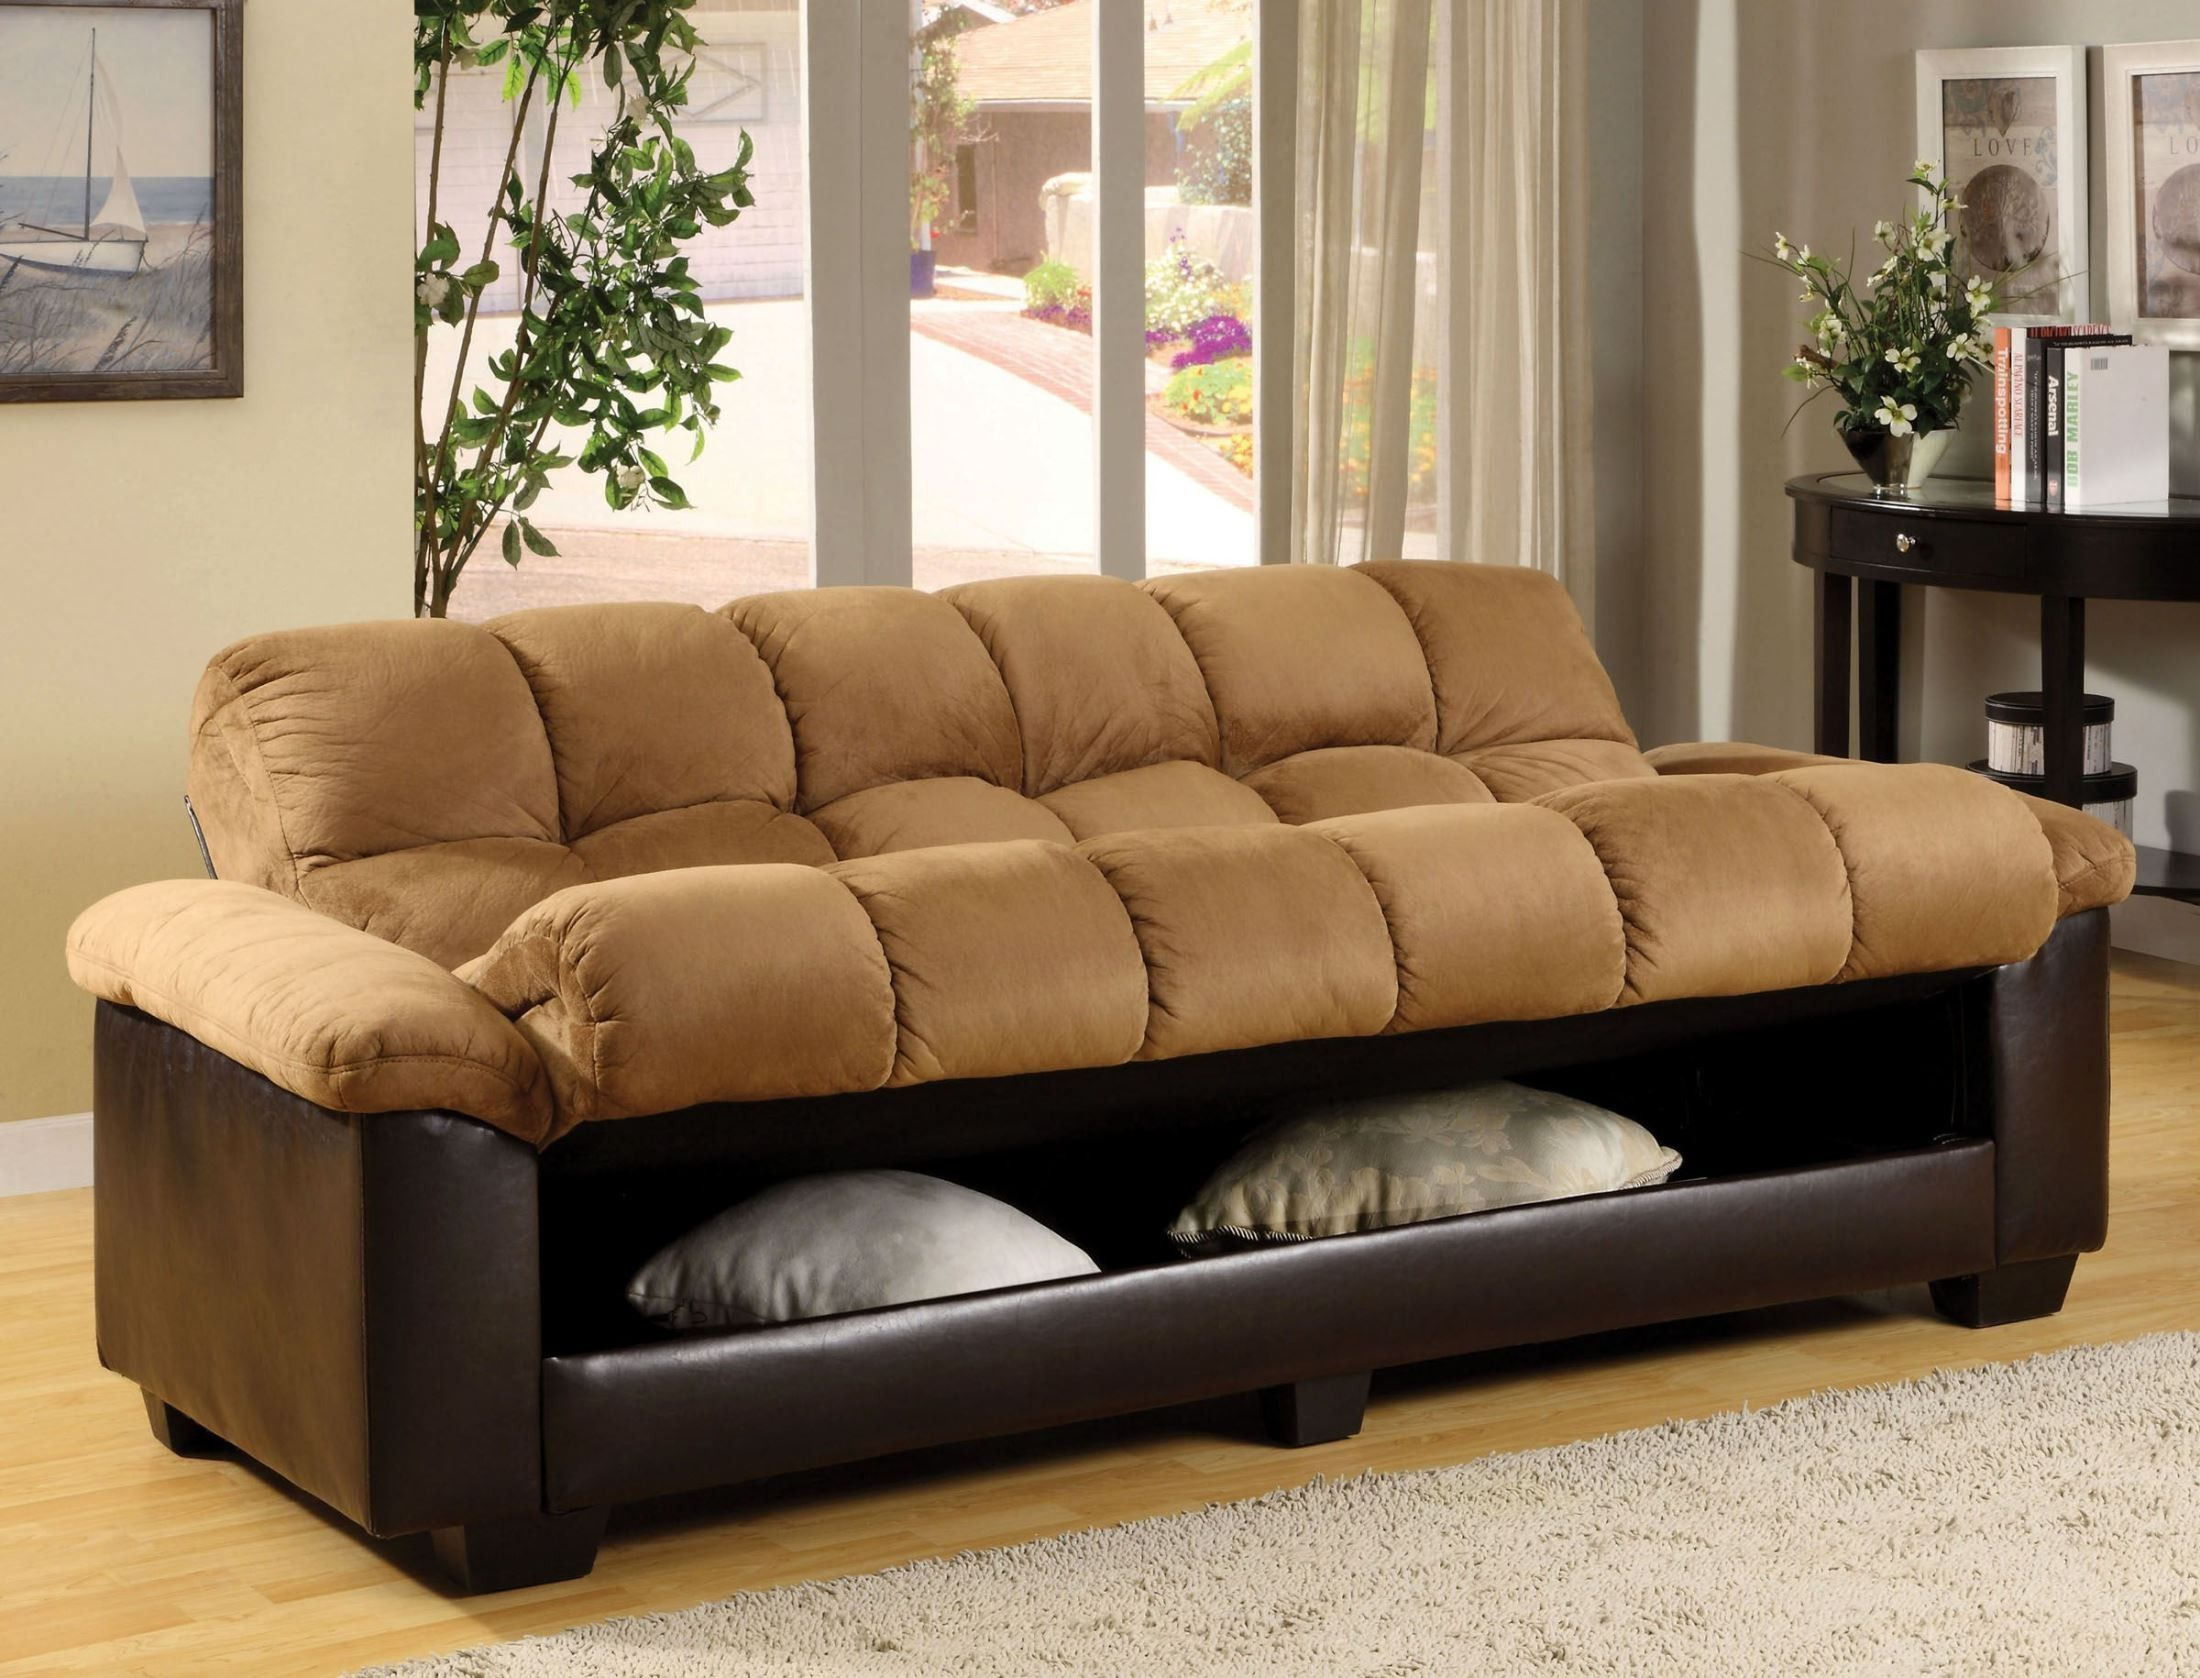 Brantford Espresso Elephant Skin Microfiber Futon Sofa